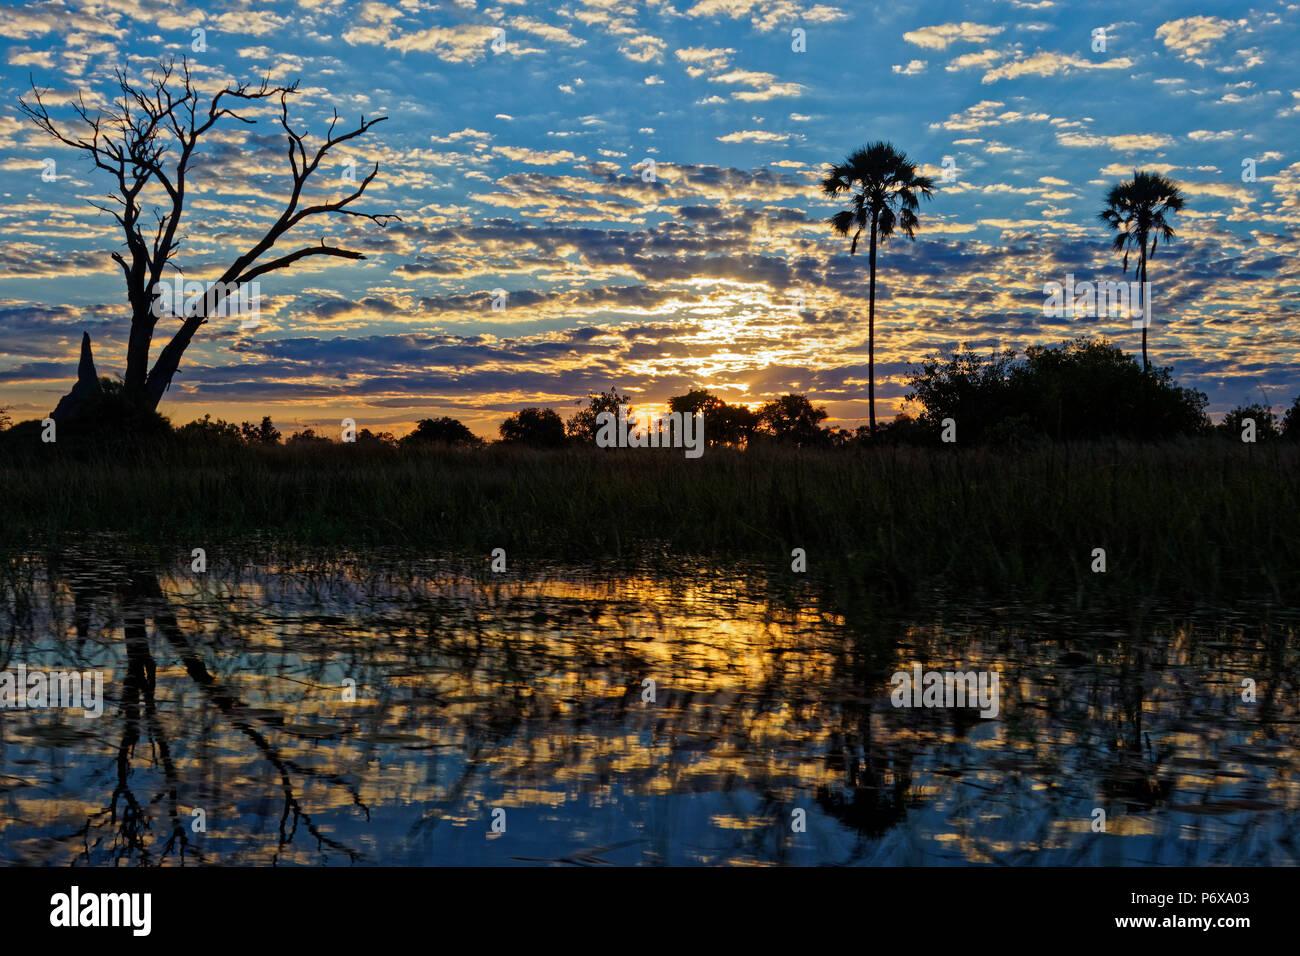 Sunrise in the Okavango Delta, Botswana - Stock Image